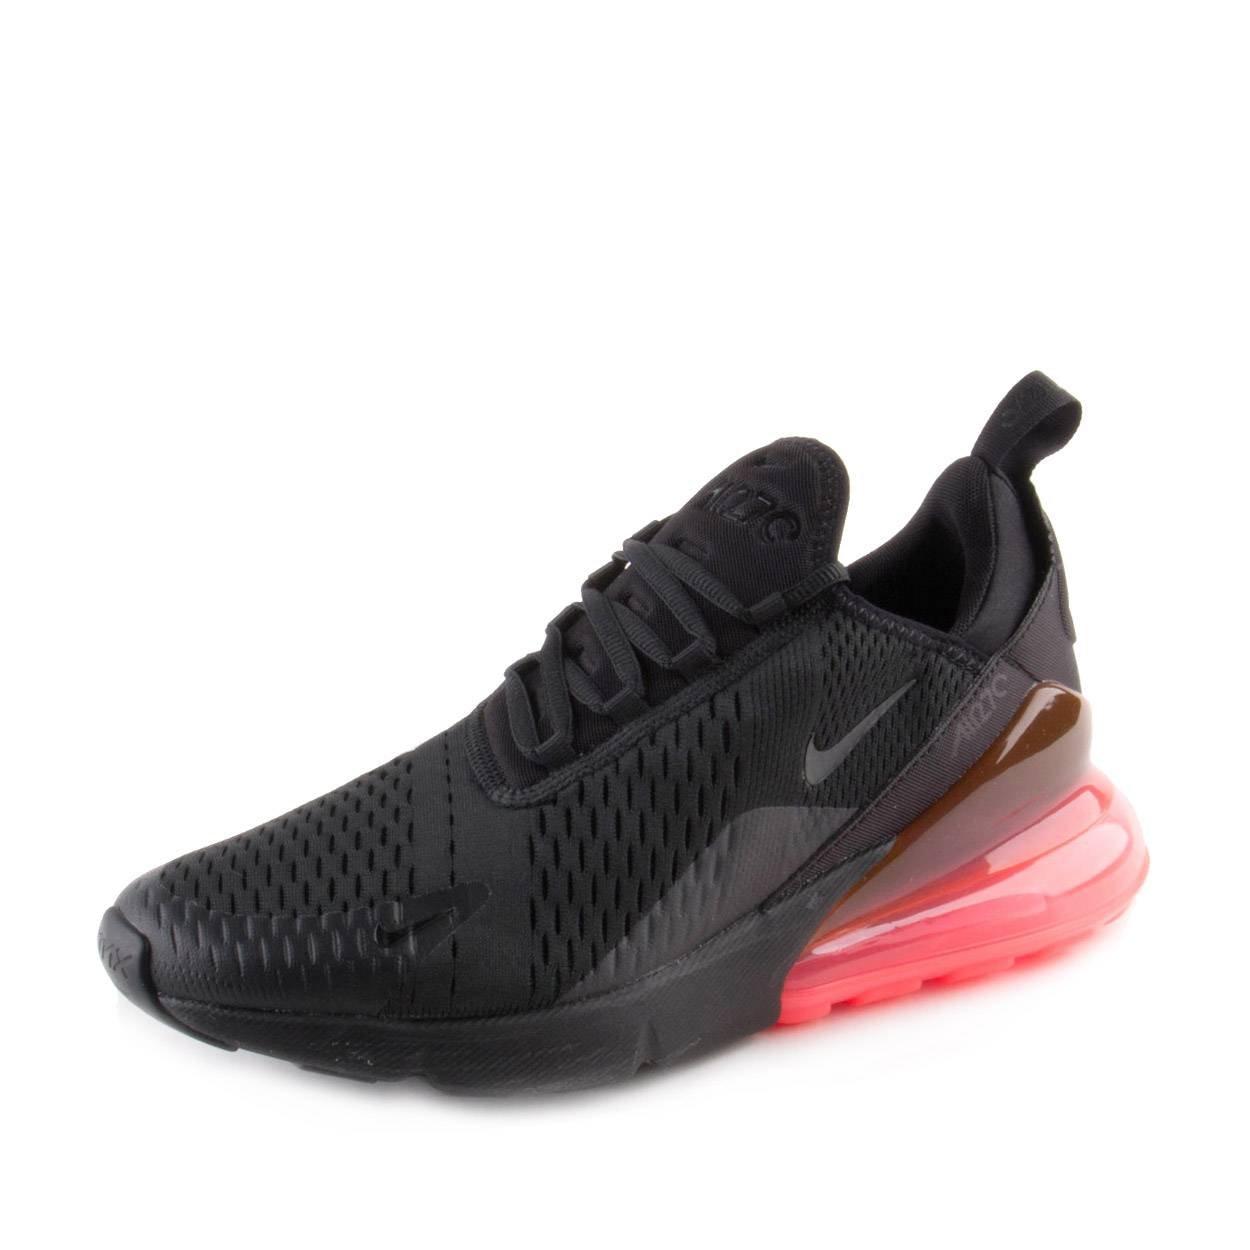 9030e32a7bb08 Galleon - Nike Mens Air Max 270 Black/Hot-Punch Mesh Size 10.5